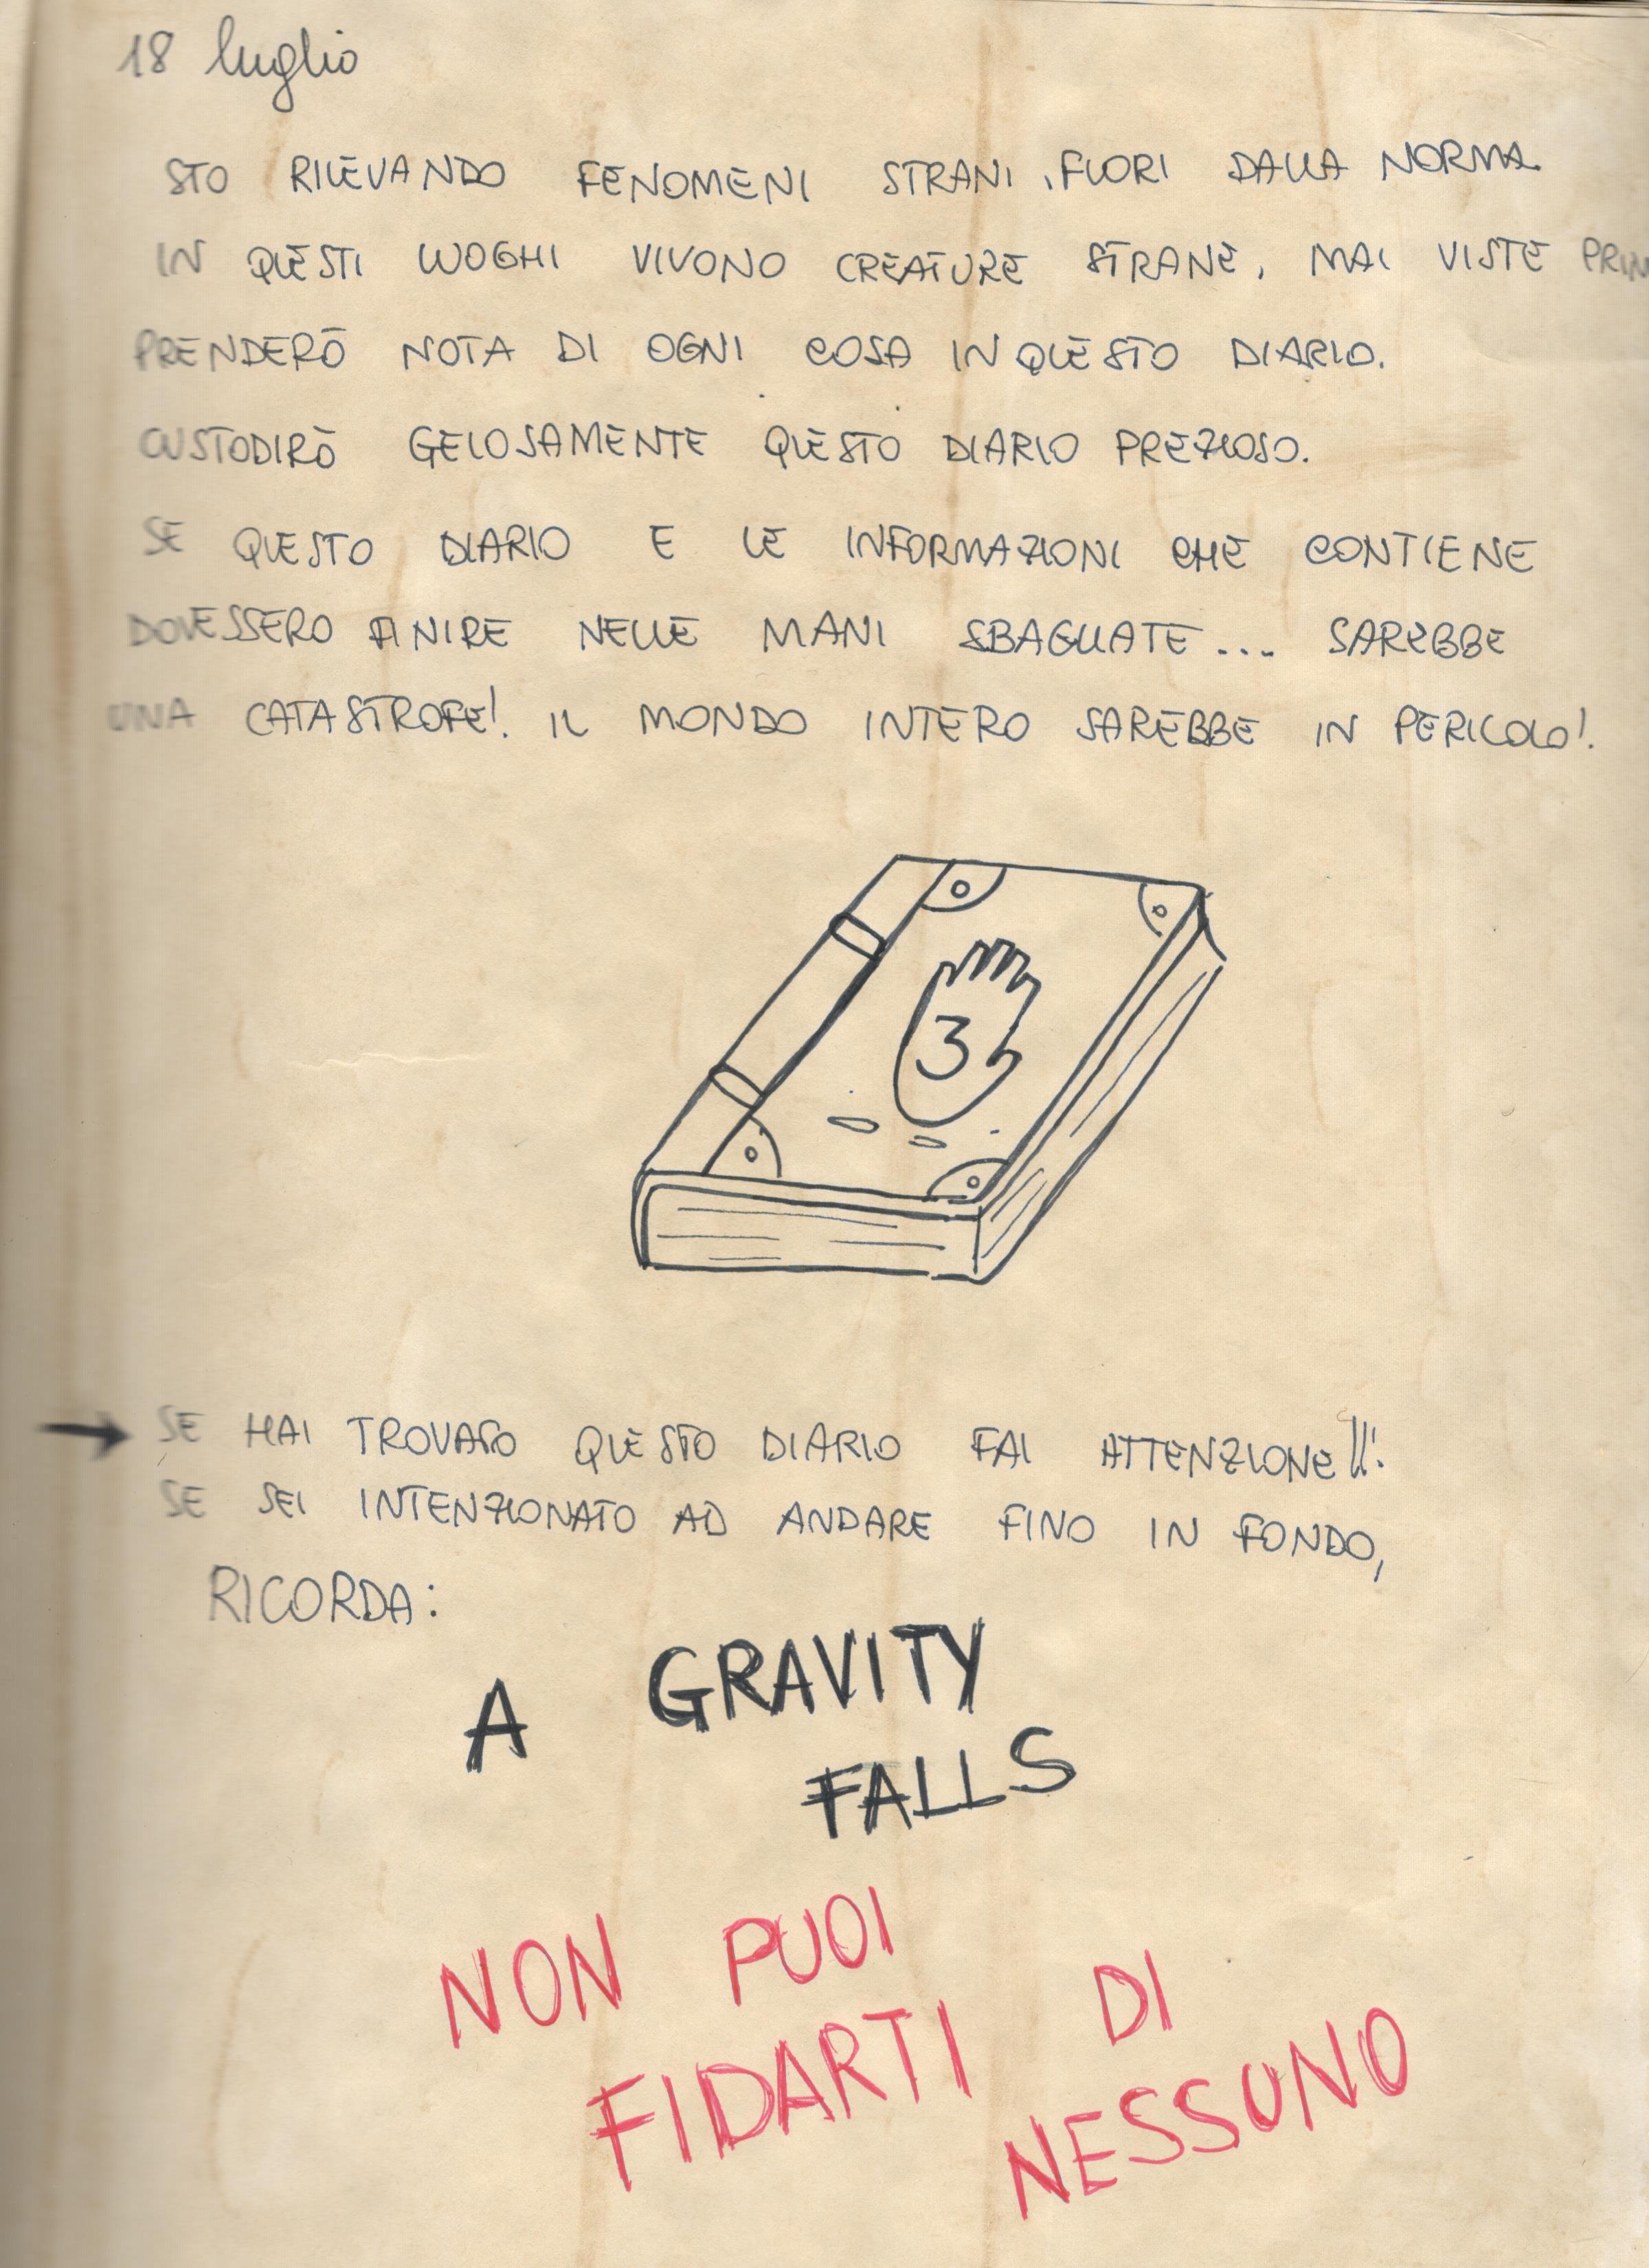 Diario_03_Gravity_Falls_Meschia_2019_-21